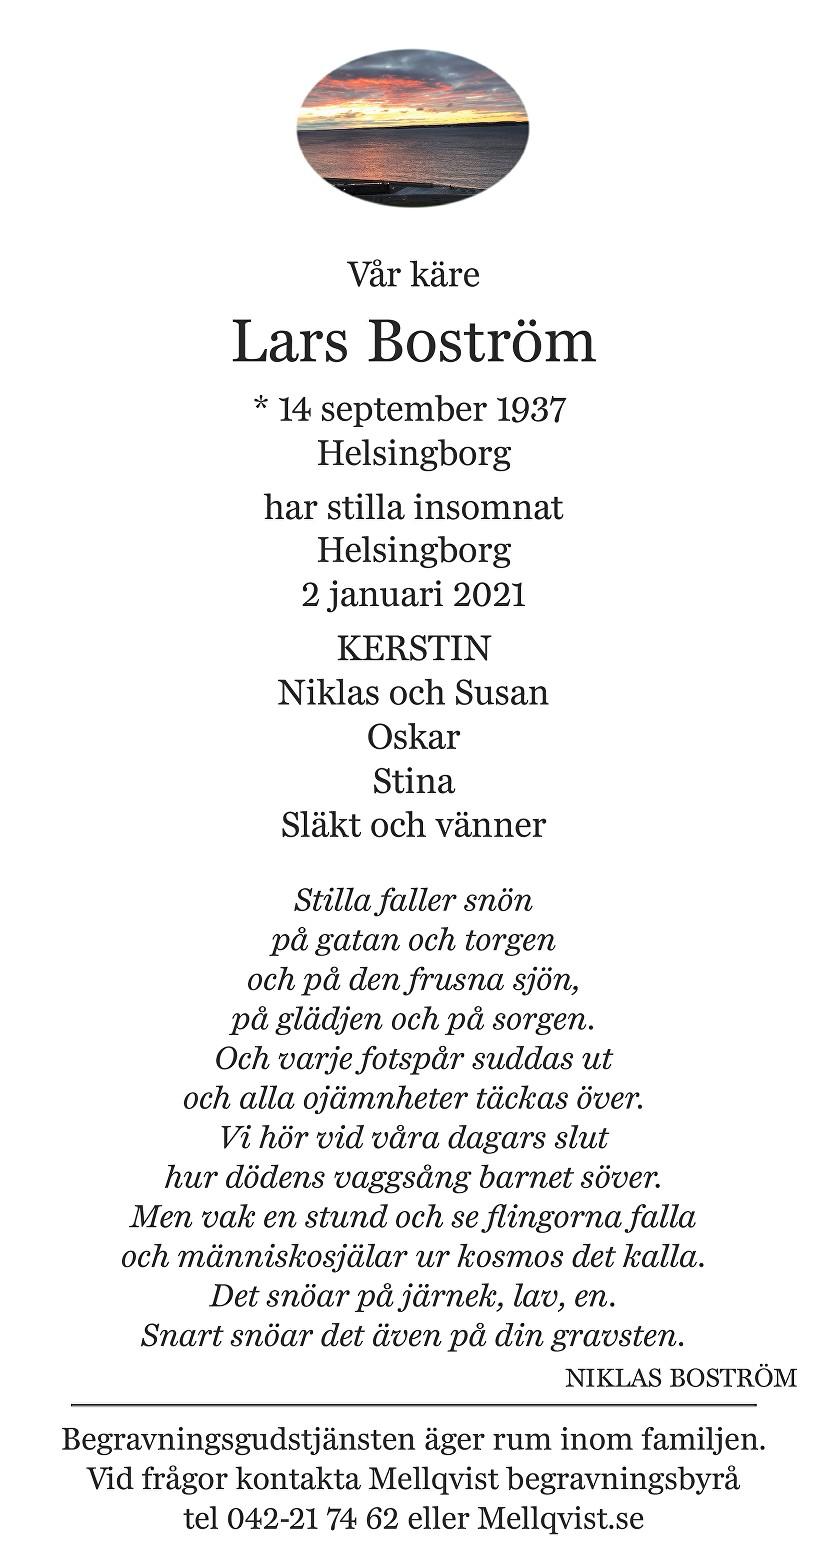 Lars Boström Death notice